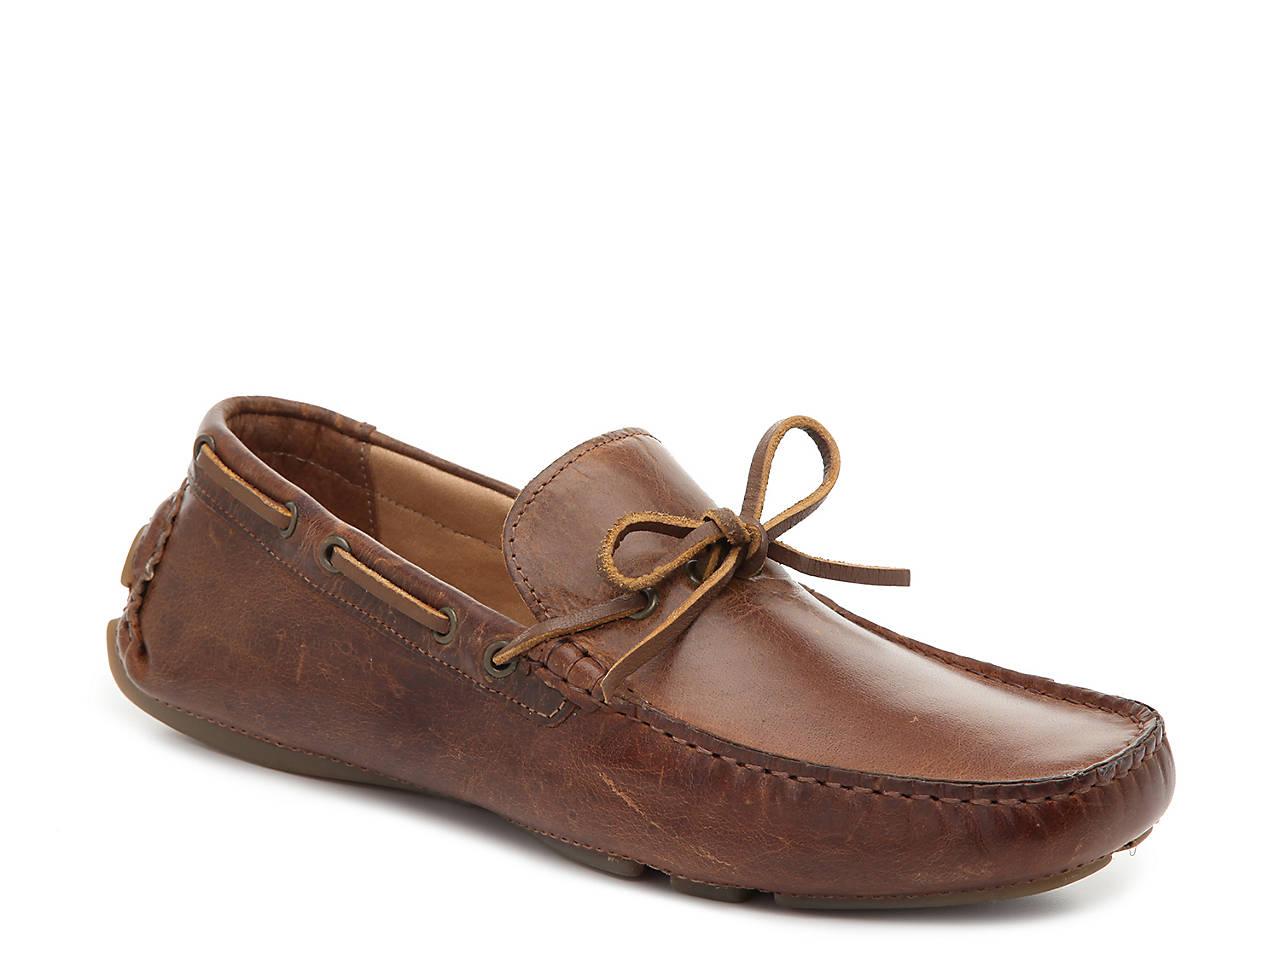 262f820513c3b5 Crevo Kroozer Loafer Men's Shoes   DSW